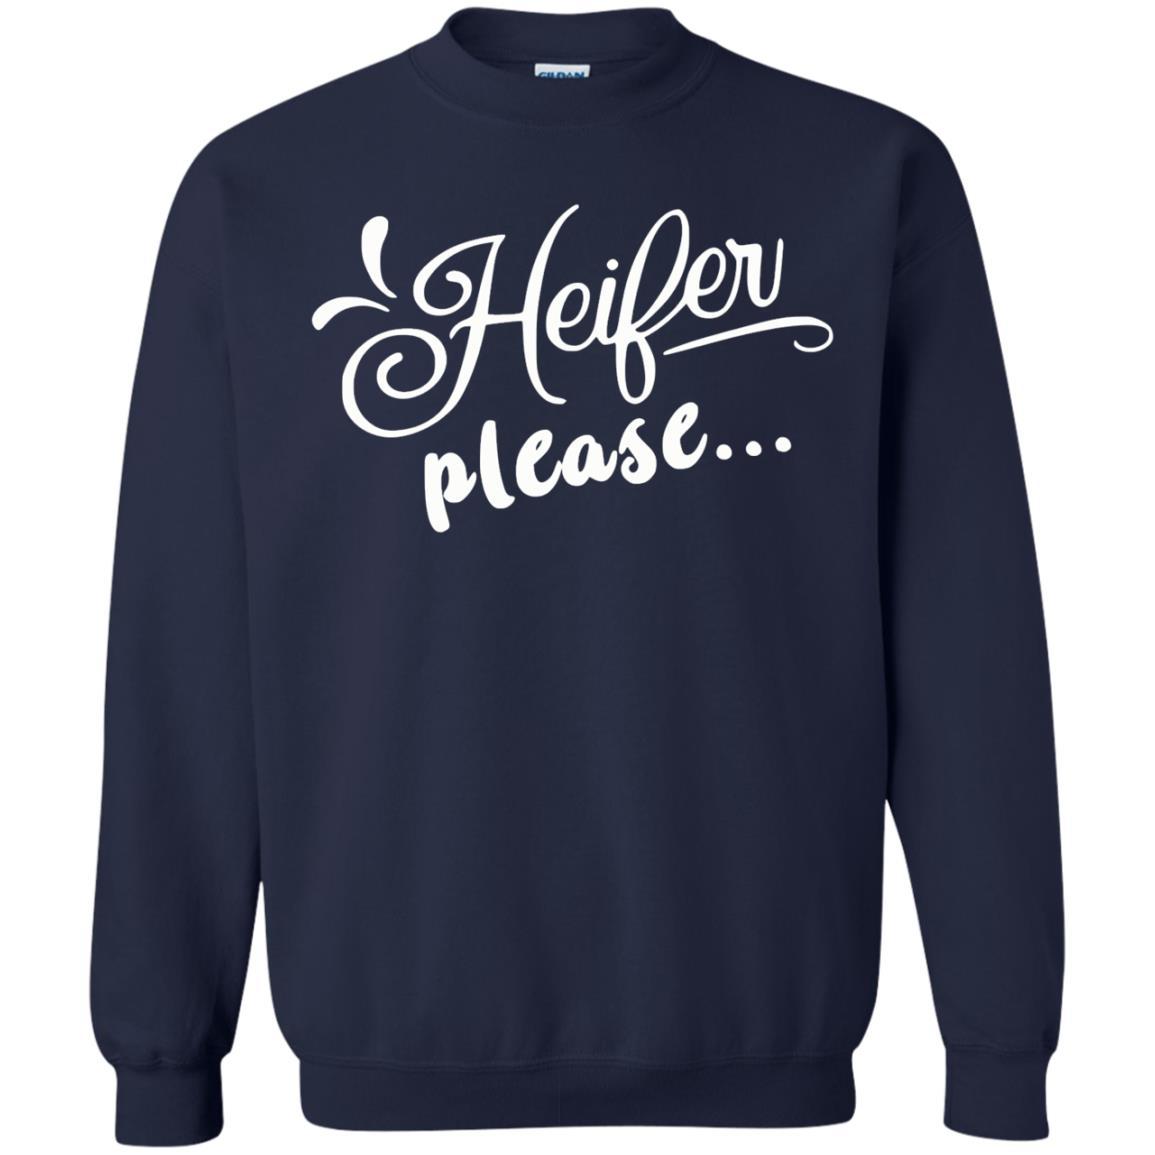 image 2152 - Heifer Please shirt, sweater: funny farmer apparel